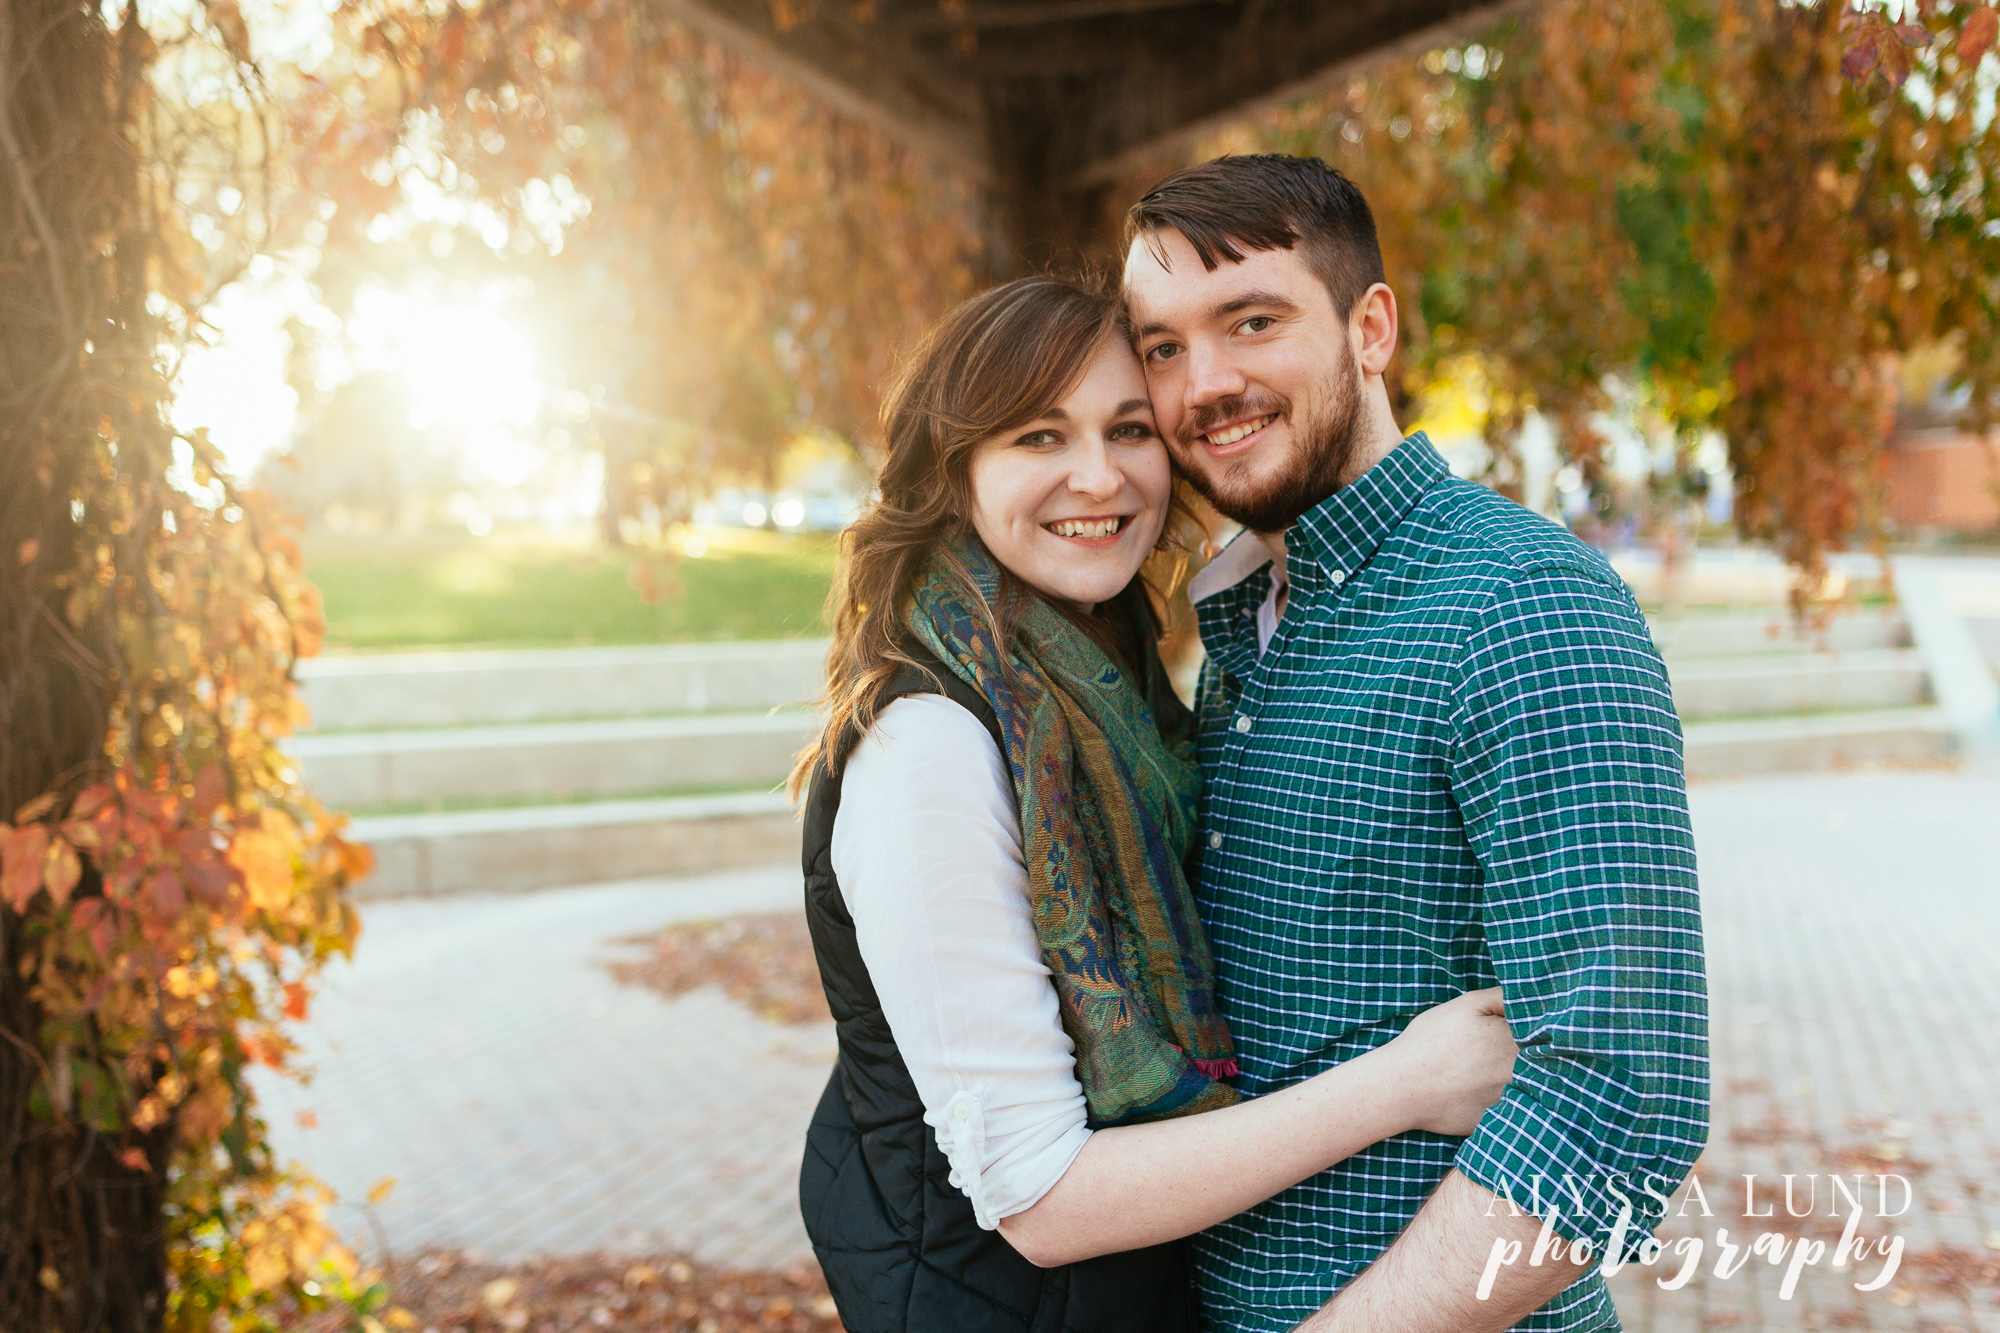 Creative Minneapolis Wedding Photography by Alyssa Lund Photography